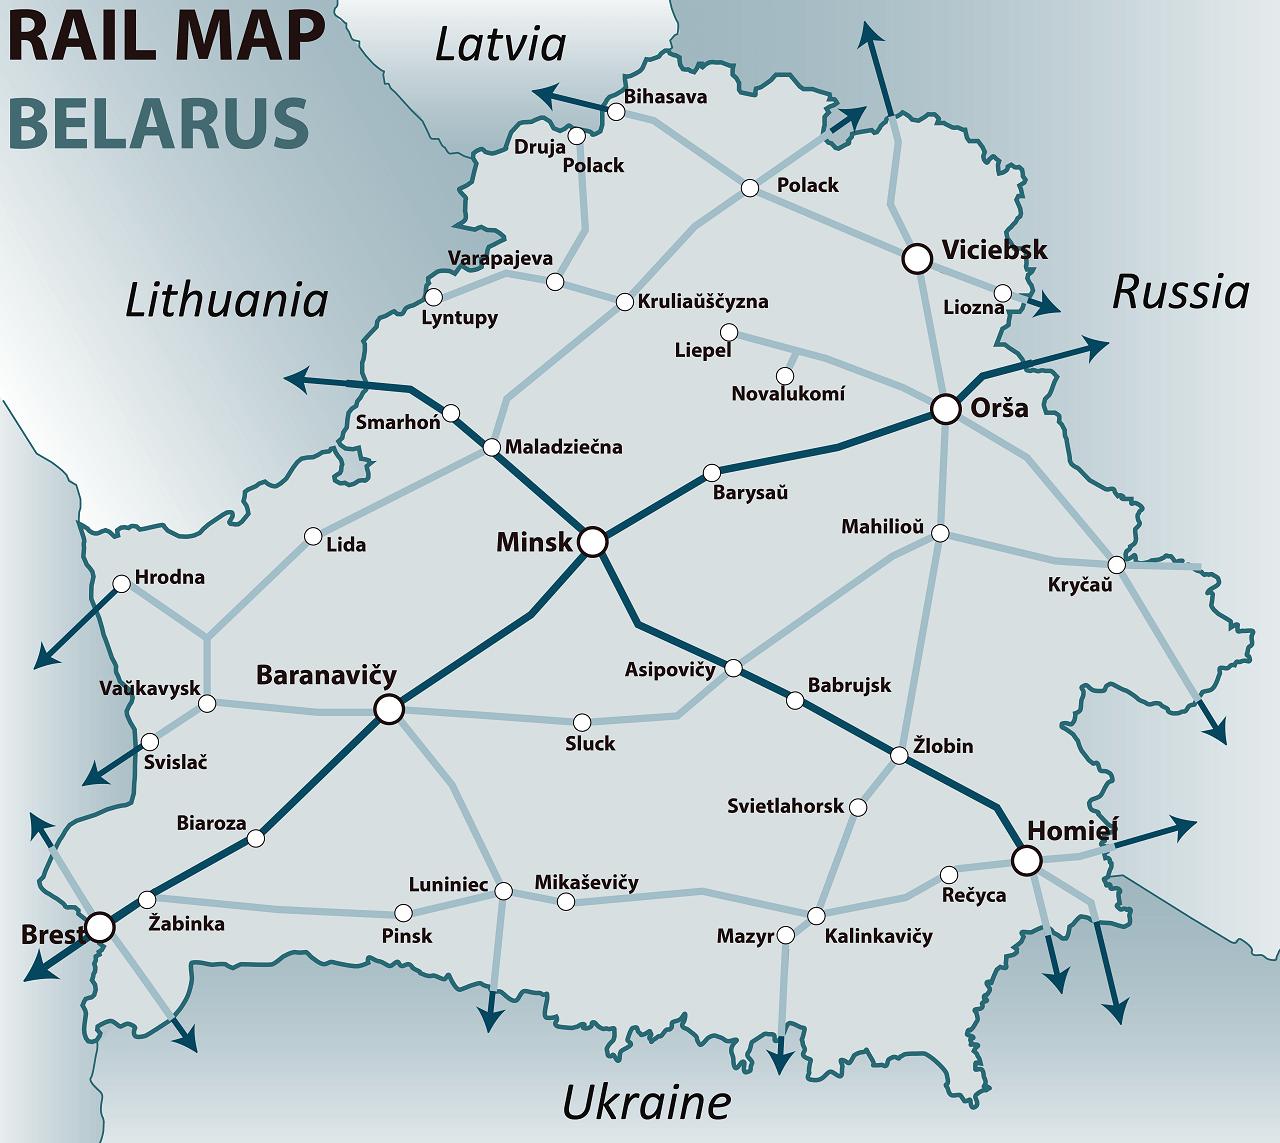 belarus rail map